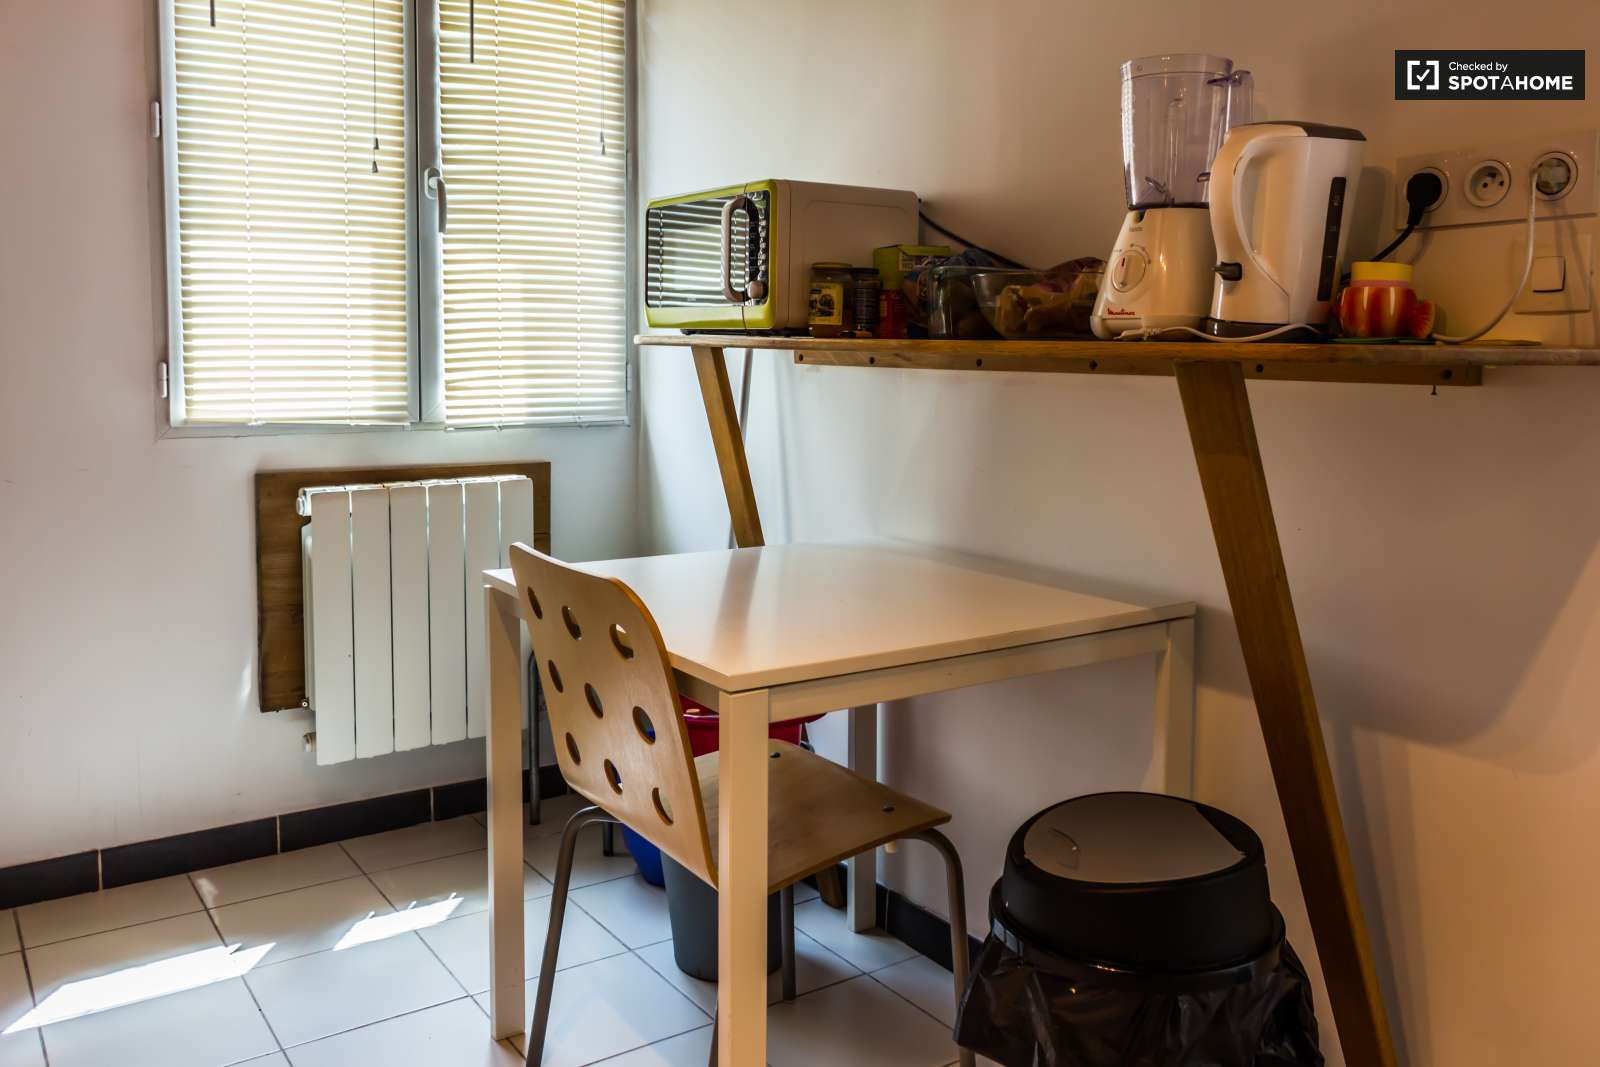 Studio Apartment With Mezzanine studio apartment with mezzanine for rent in parilly, lyon | spotahome